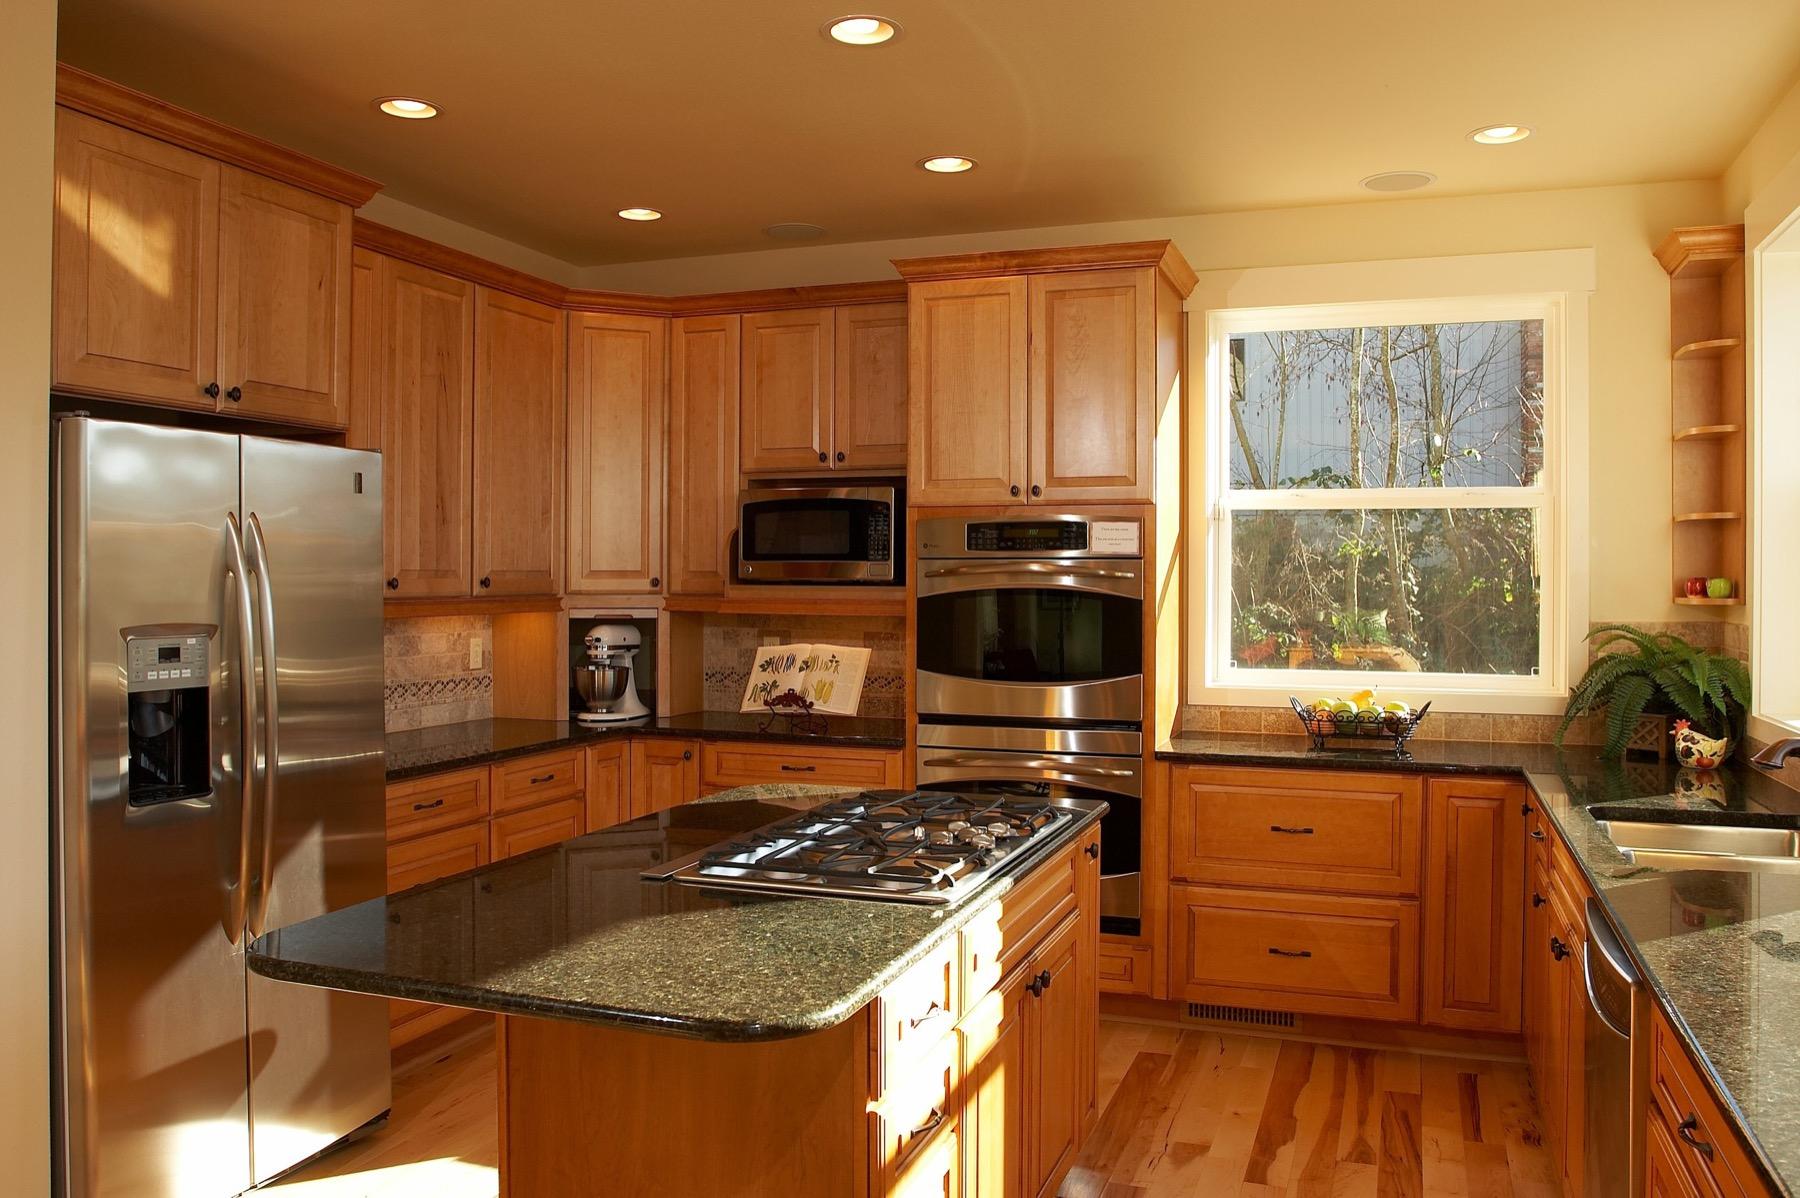 Kelley_Home_Services_Gig_Harbor_Home_Construction_4.jpg